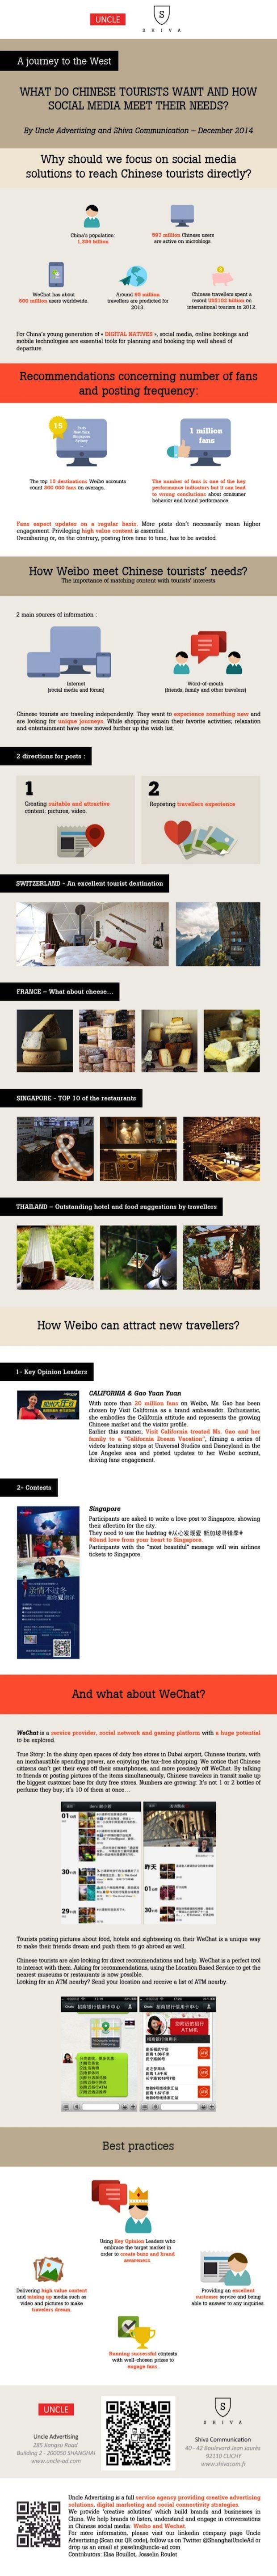 Reaching Chinese tourists via WeChat and Sina Weibo